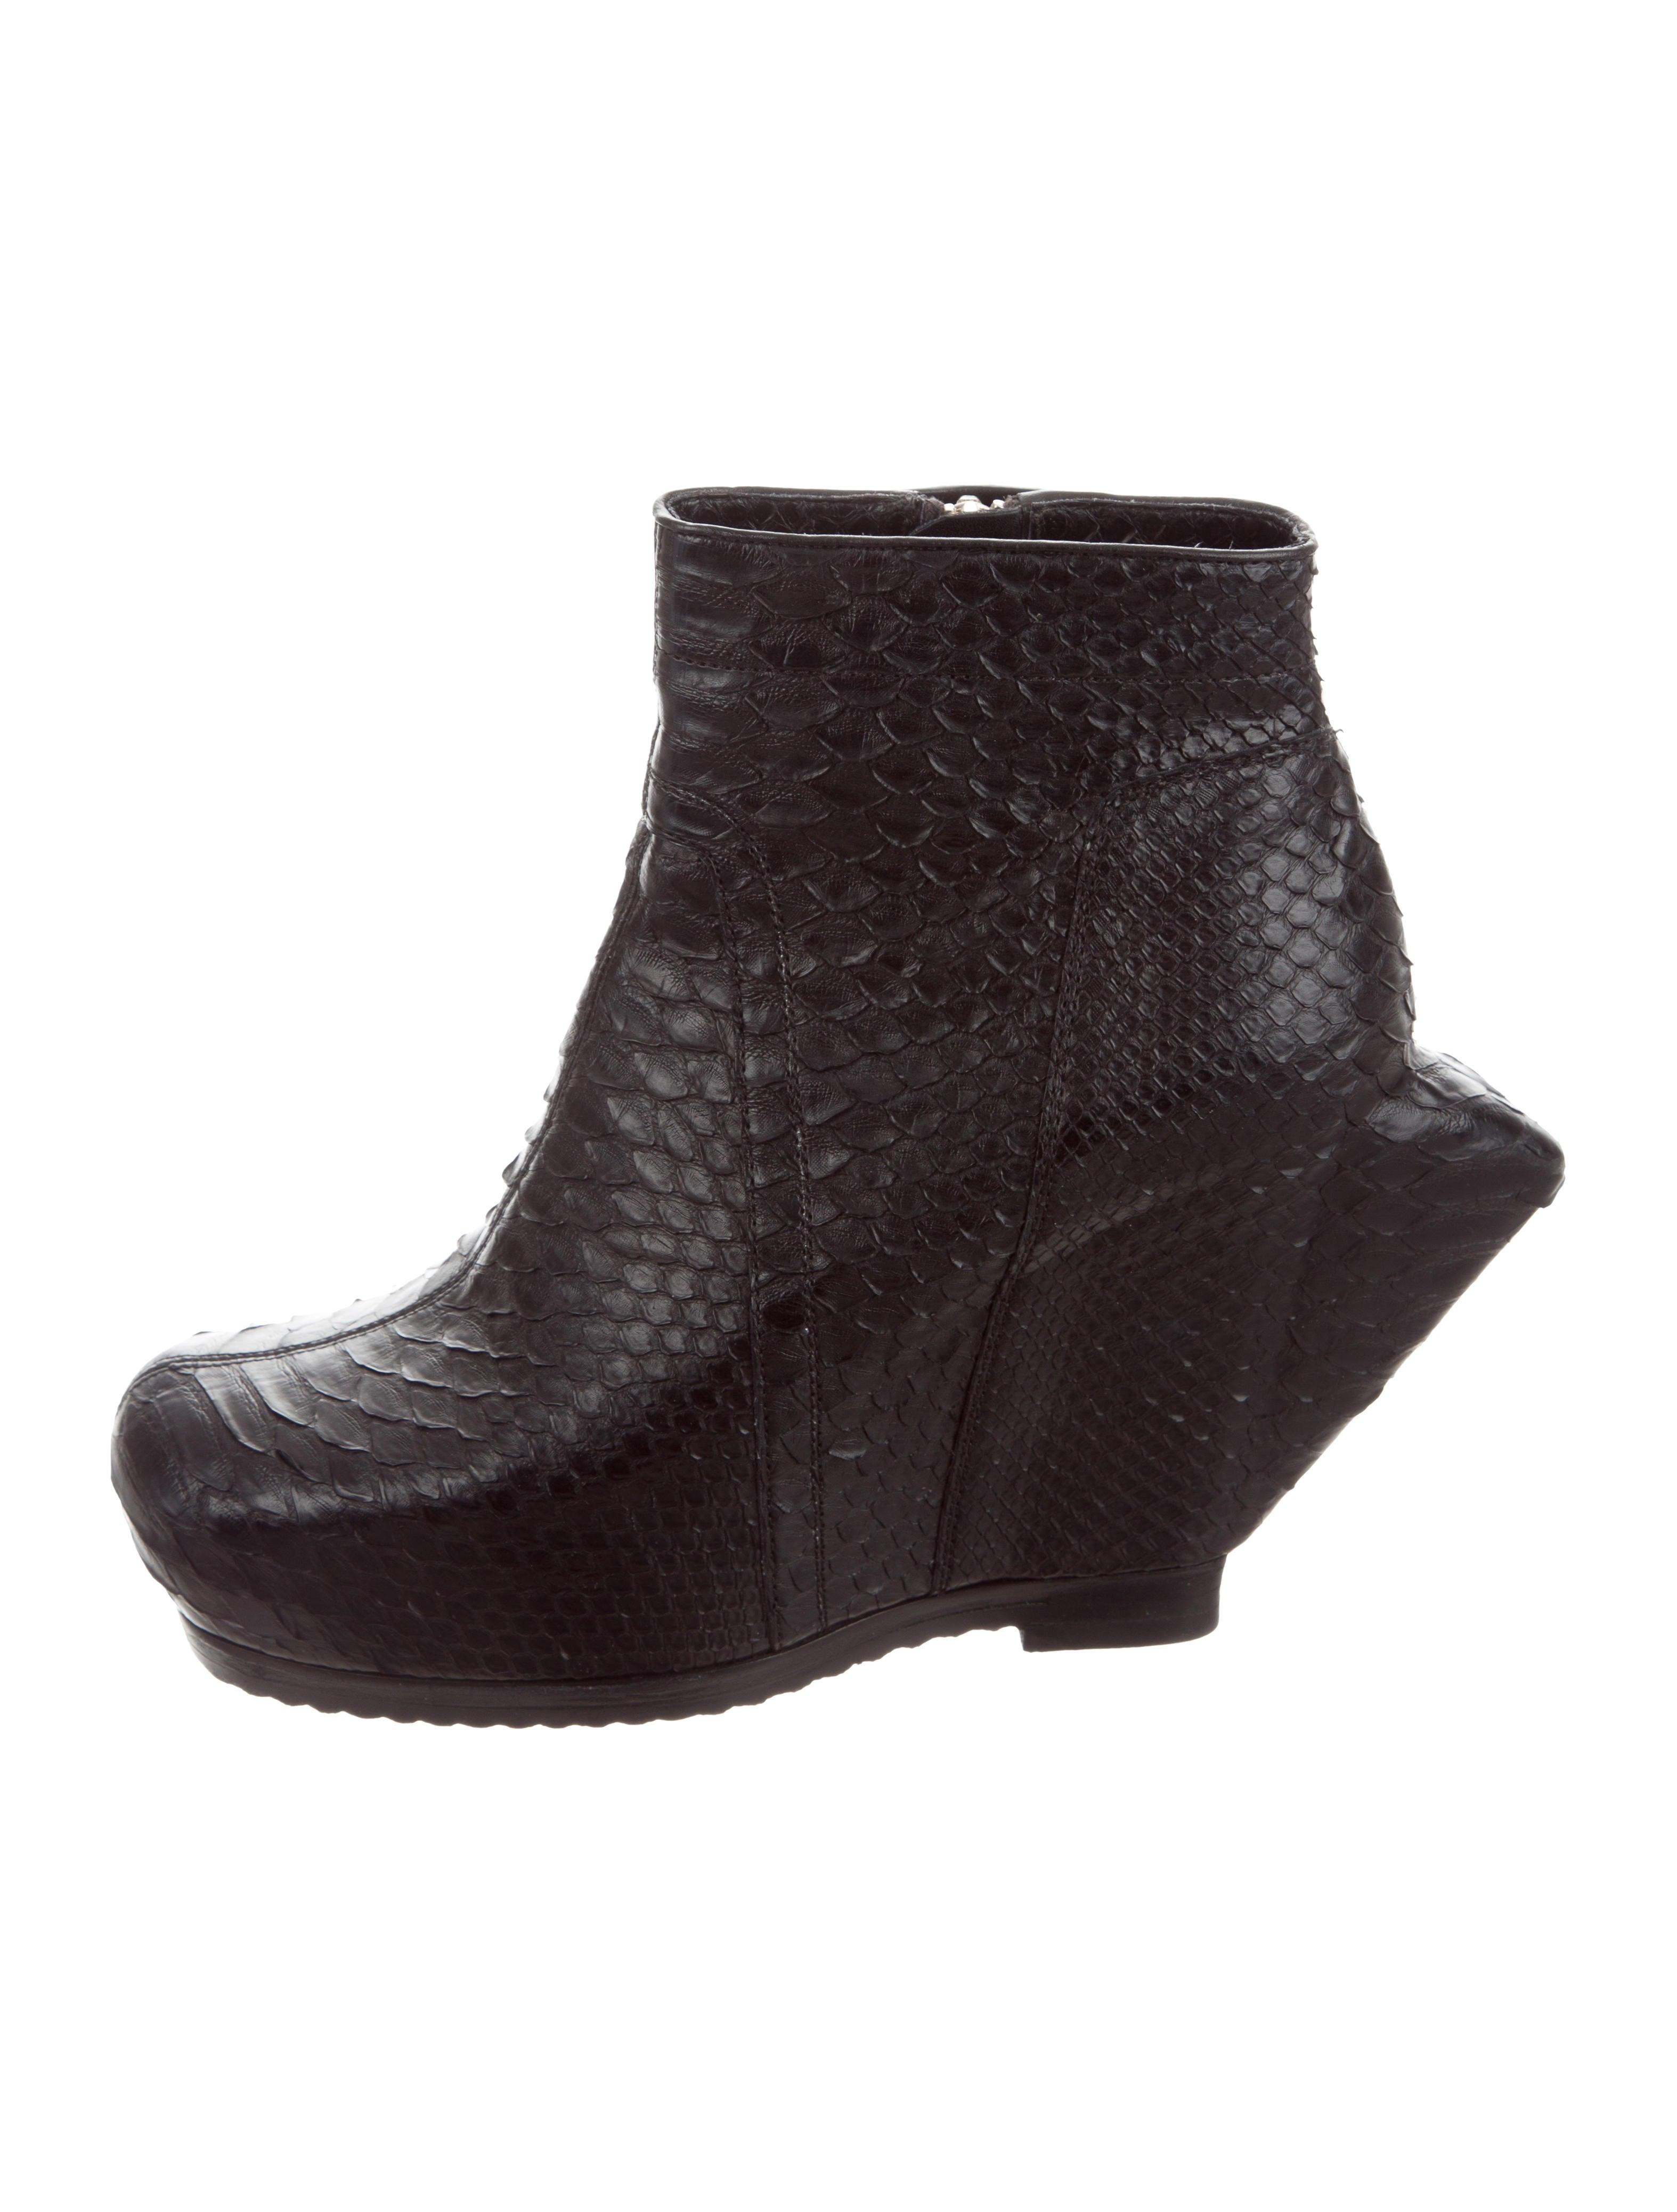 discount fashion Style Rick Owens Python Ankle Boots sale best sale recommend D5axsCnZ